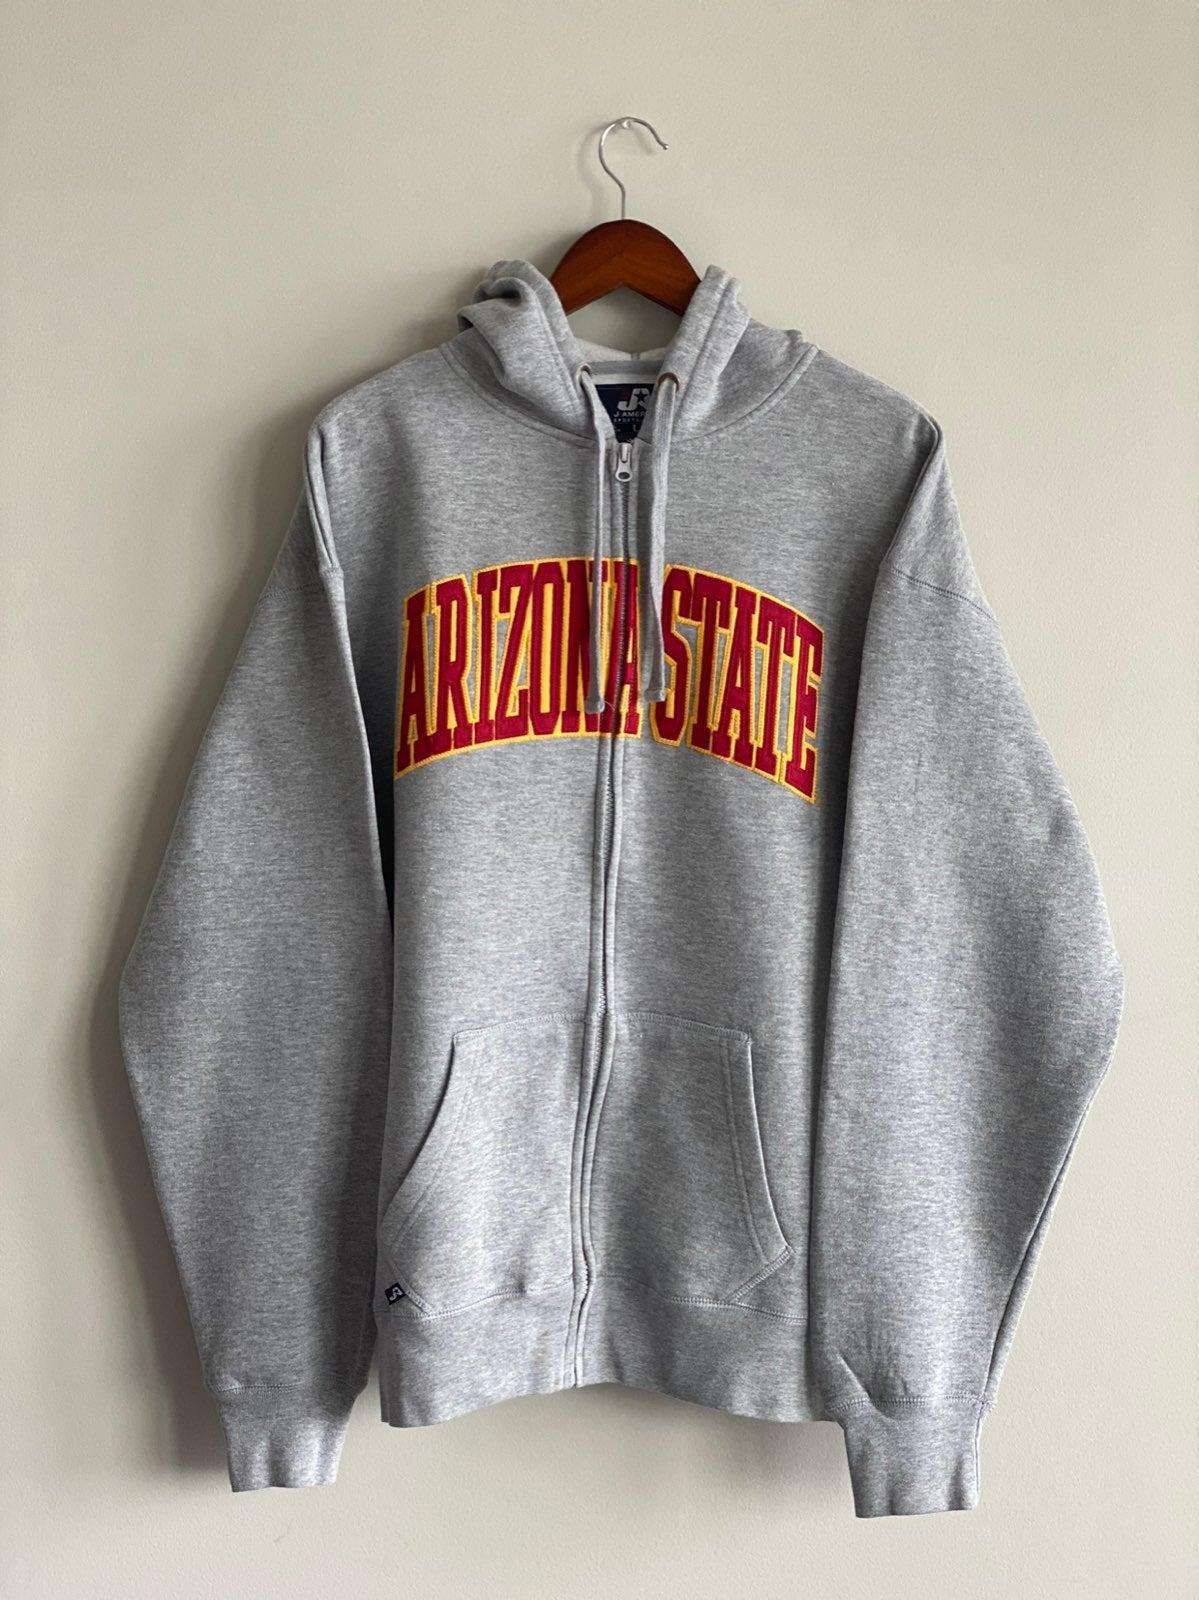 Vintage Arizona State Hoodie Sz XL